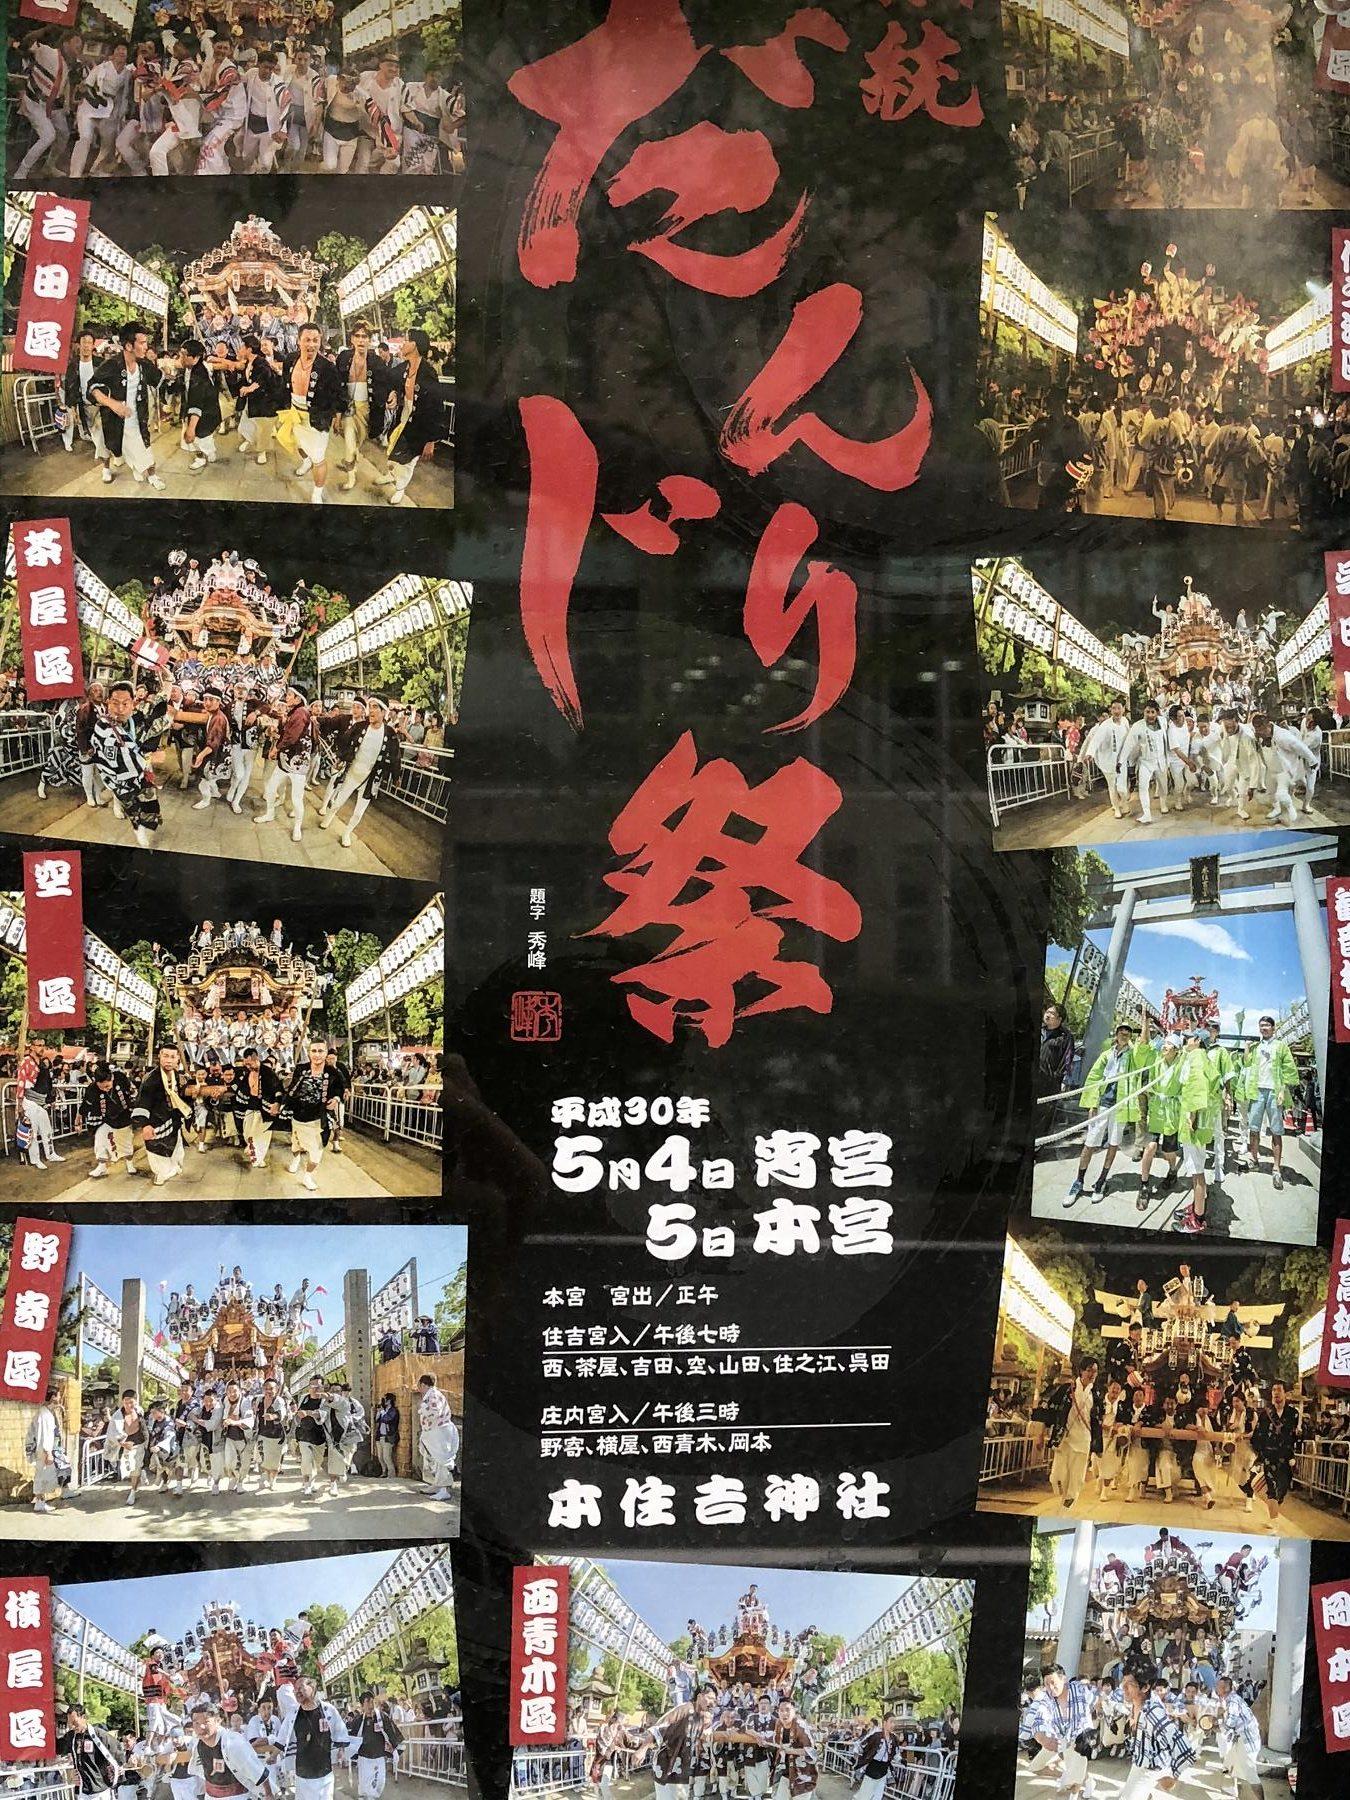 JR住吉駅南側にある本住吉神社で「だんじり祭」が5/4と5/5に開催されるよ! #東灘だんじり #だんじり祭 #本住吉神社